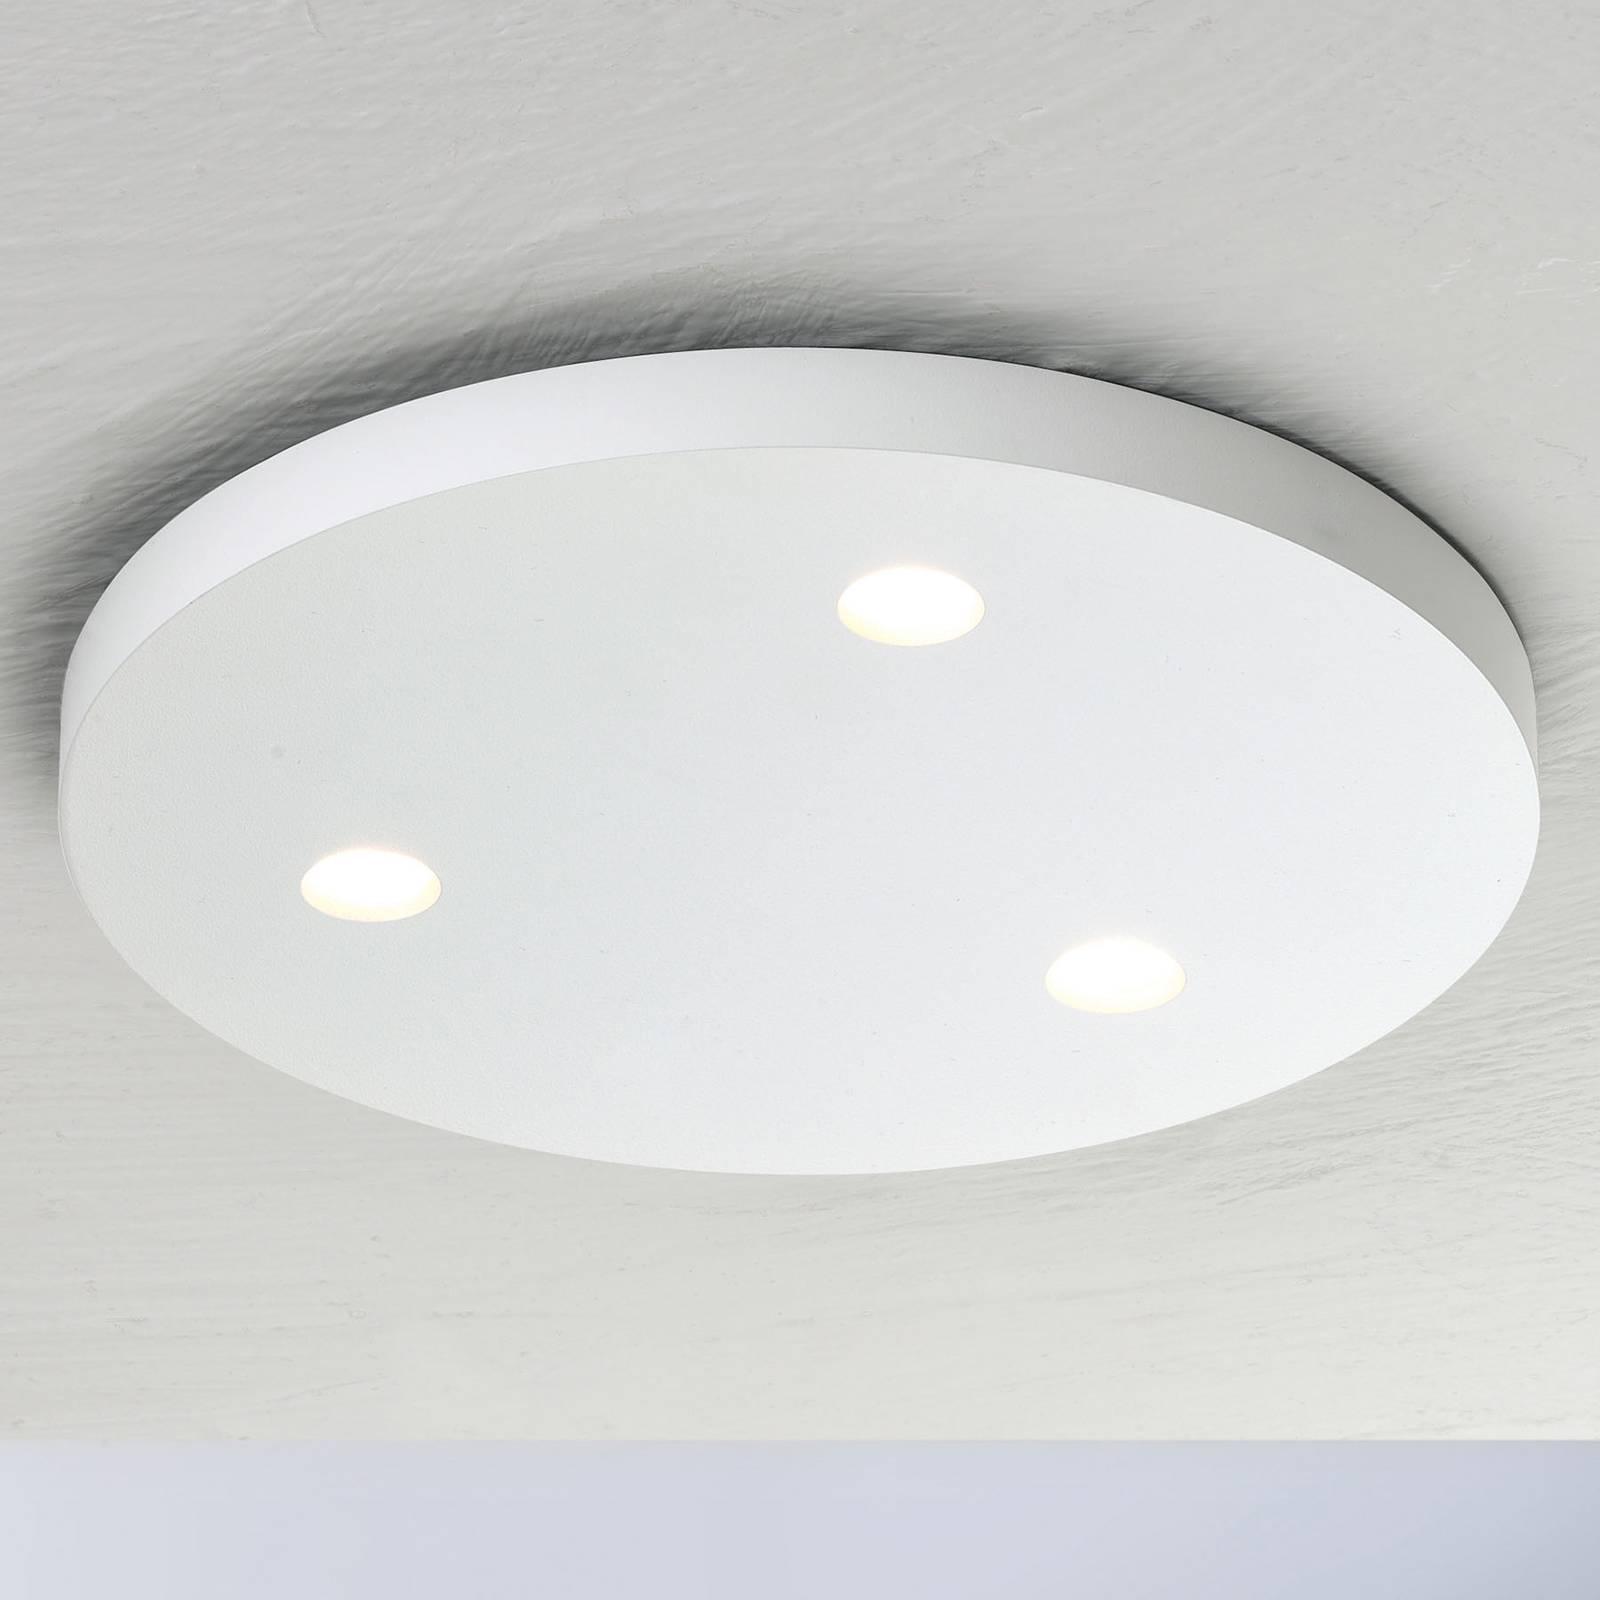 Bopp Close LED plafondlamp 3-lamps rond wit